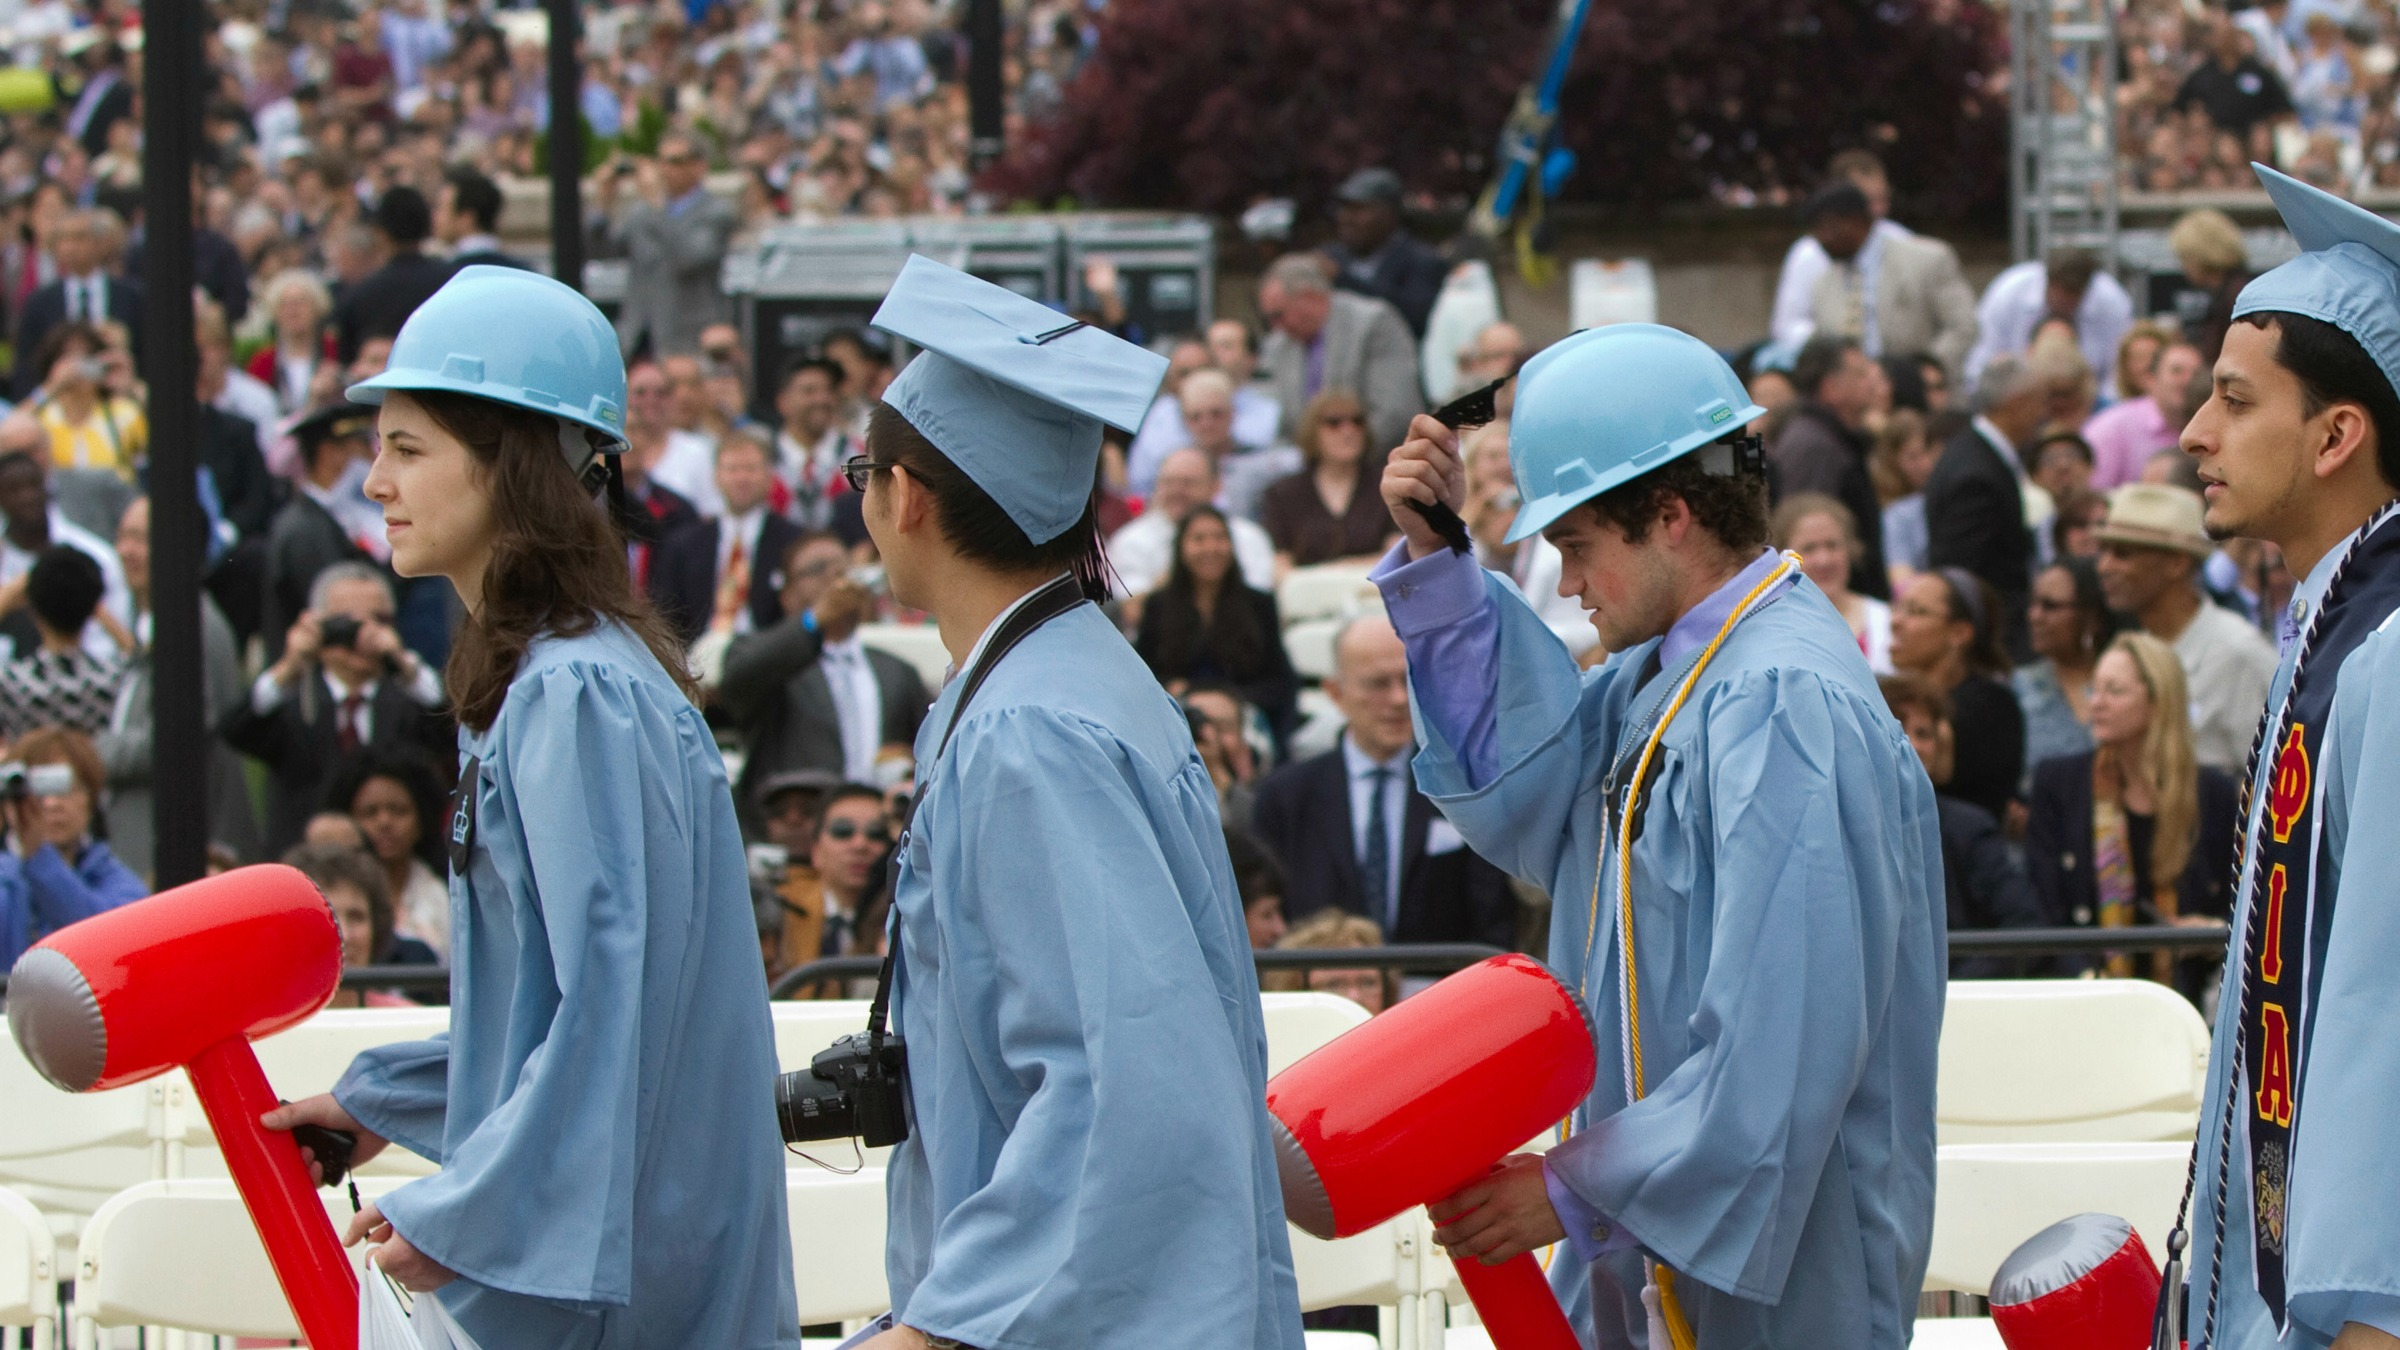 Graduates of Columbia's Engineering school